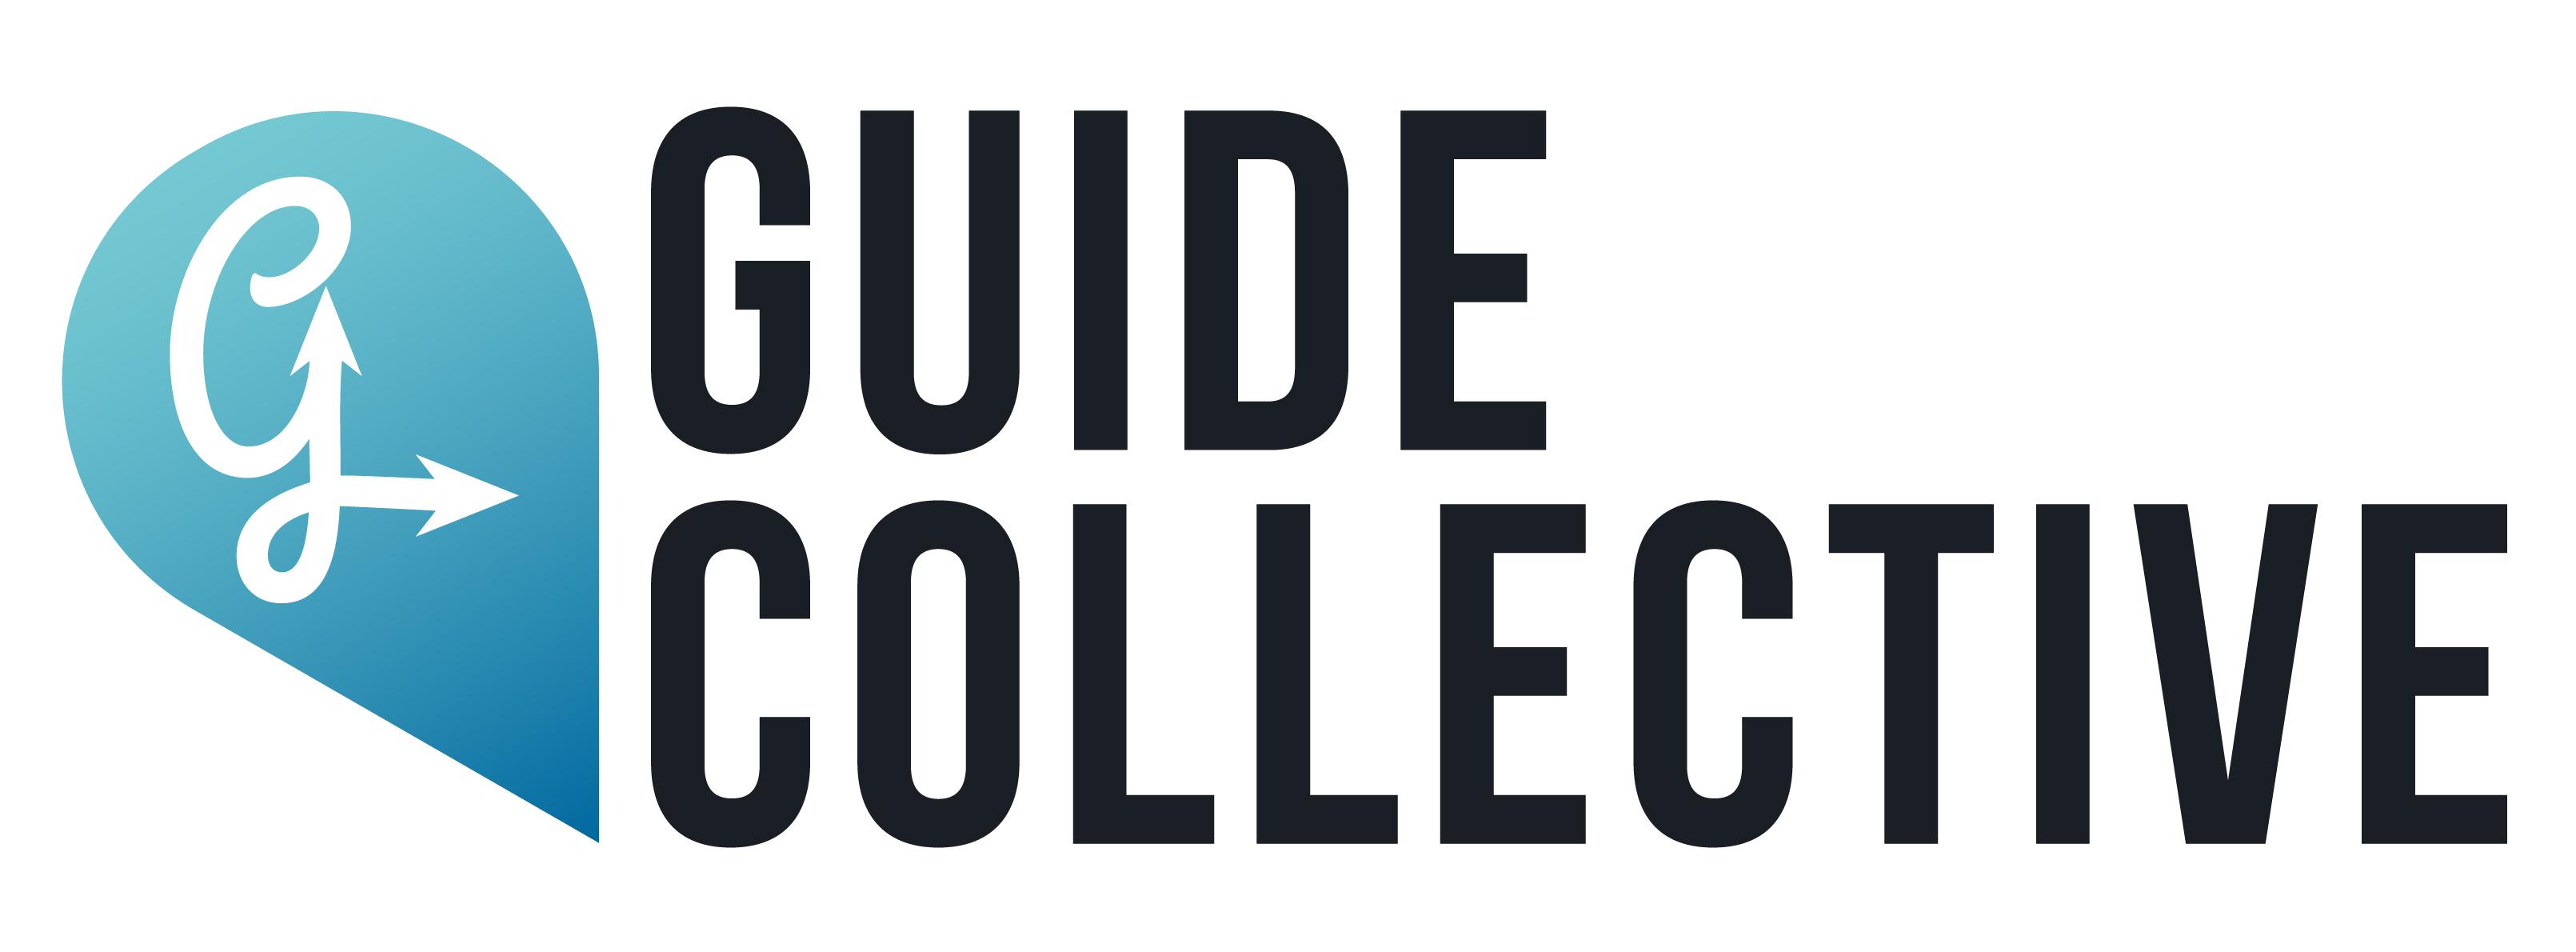 Guide Collective-Colour